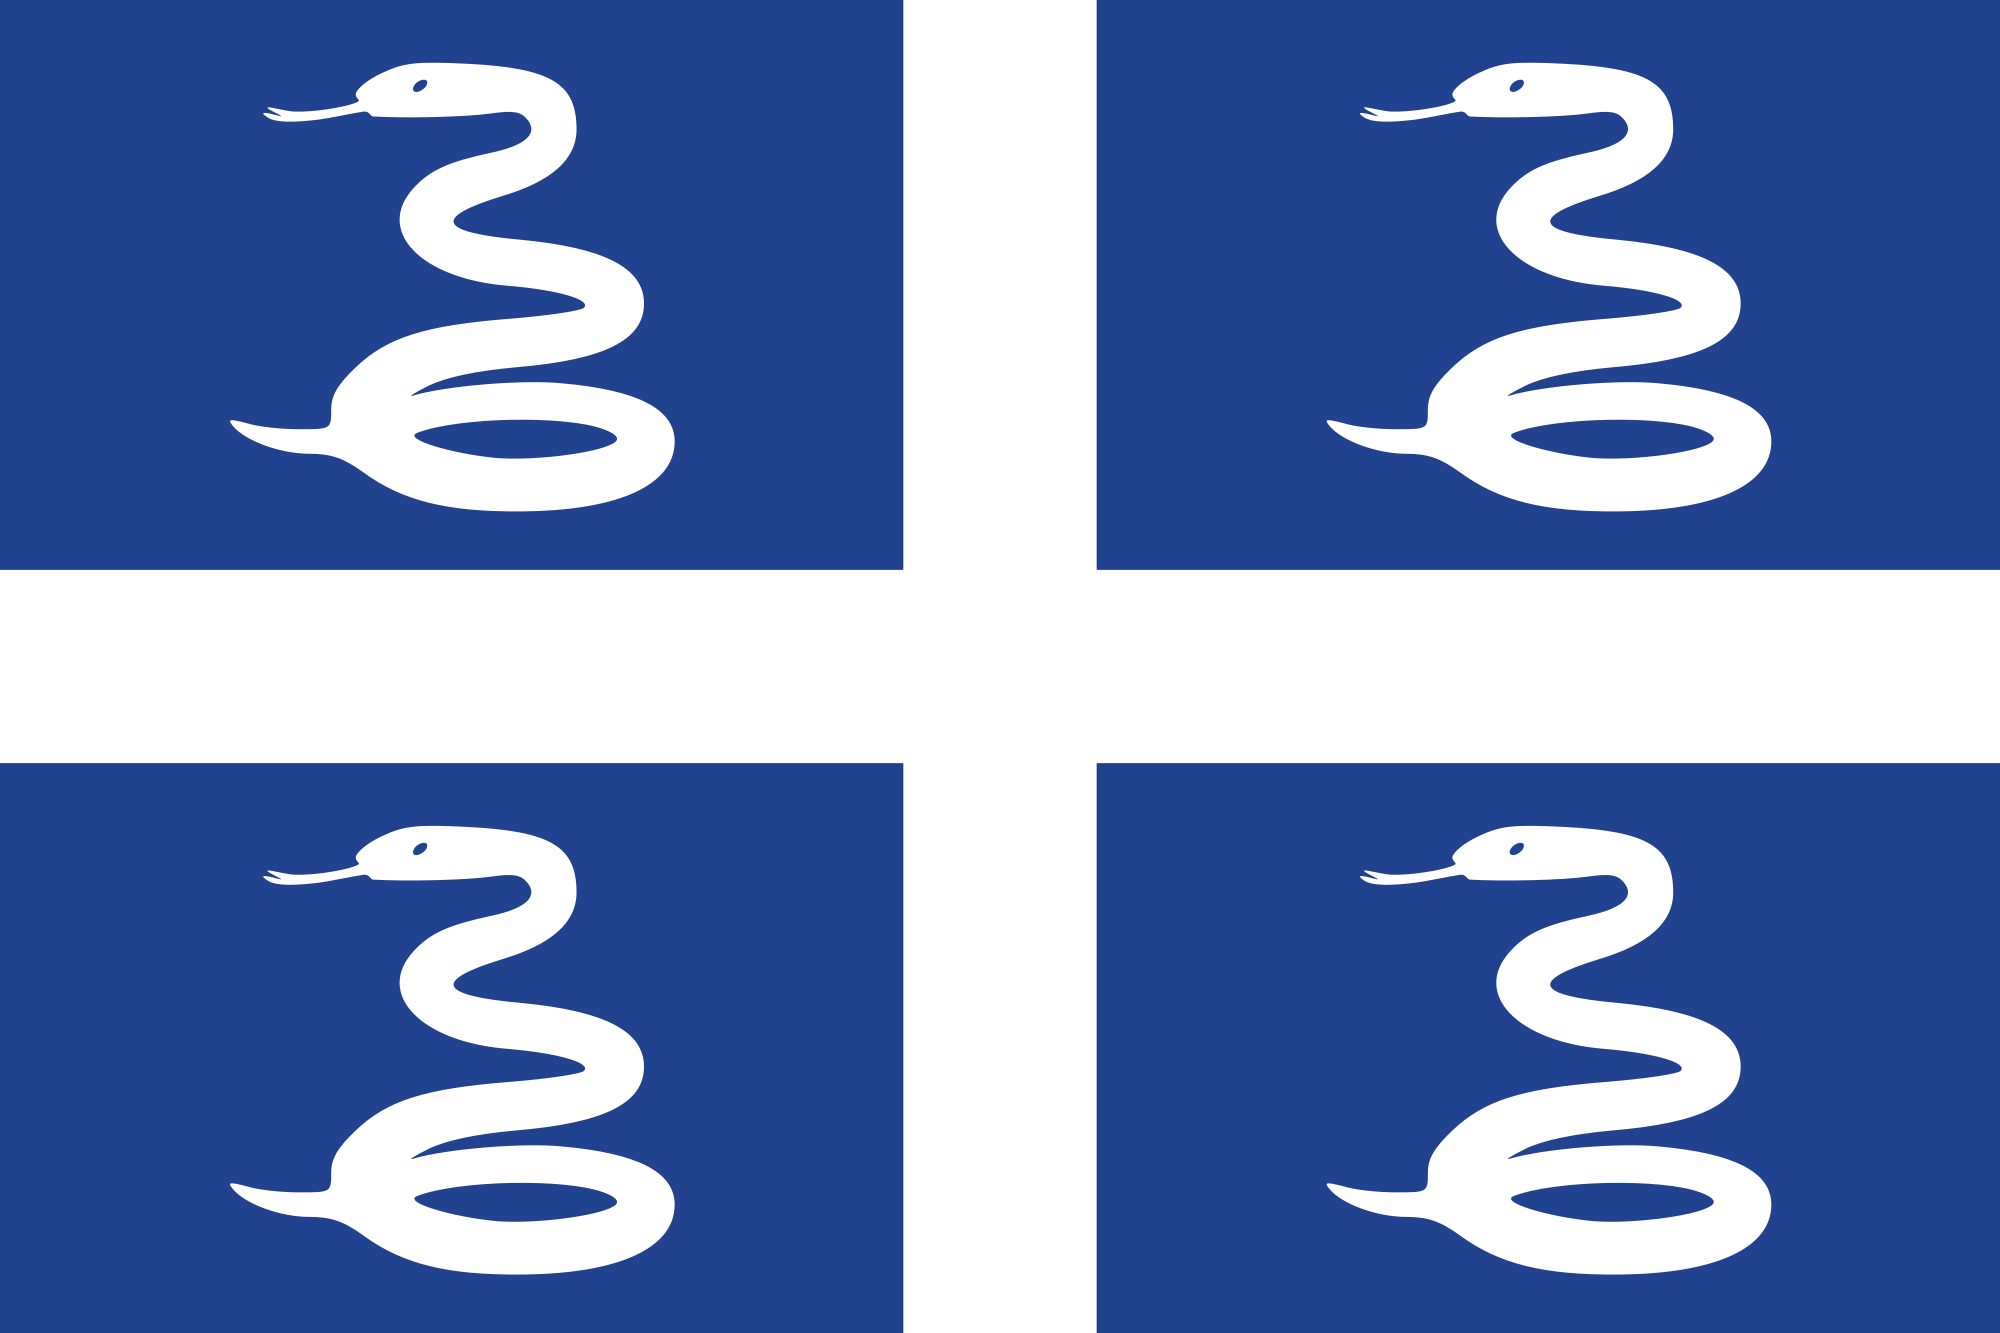 Martinica, paese, emblema, logo, simbolo - Sfondi HD - Professor-falken.com